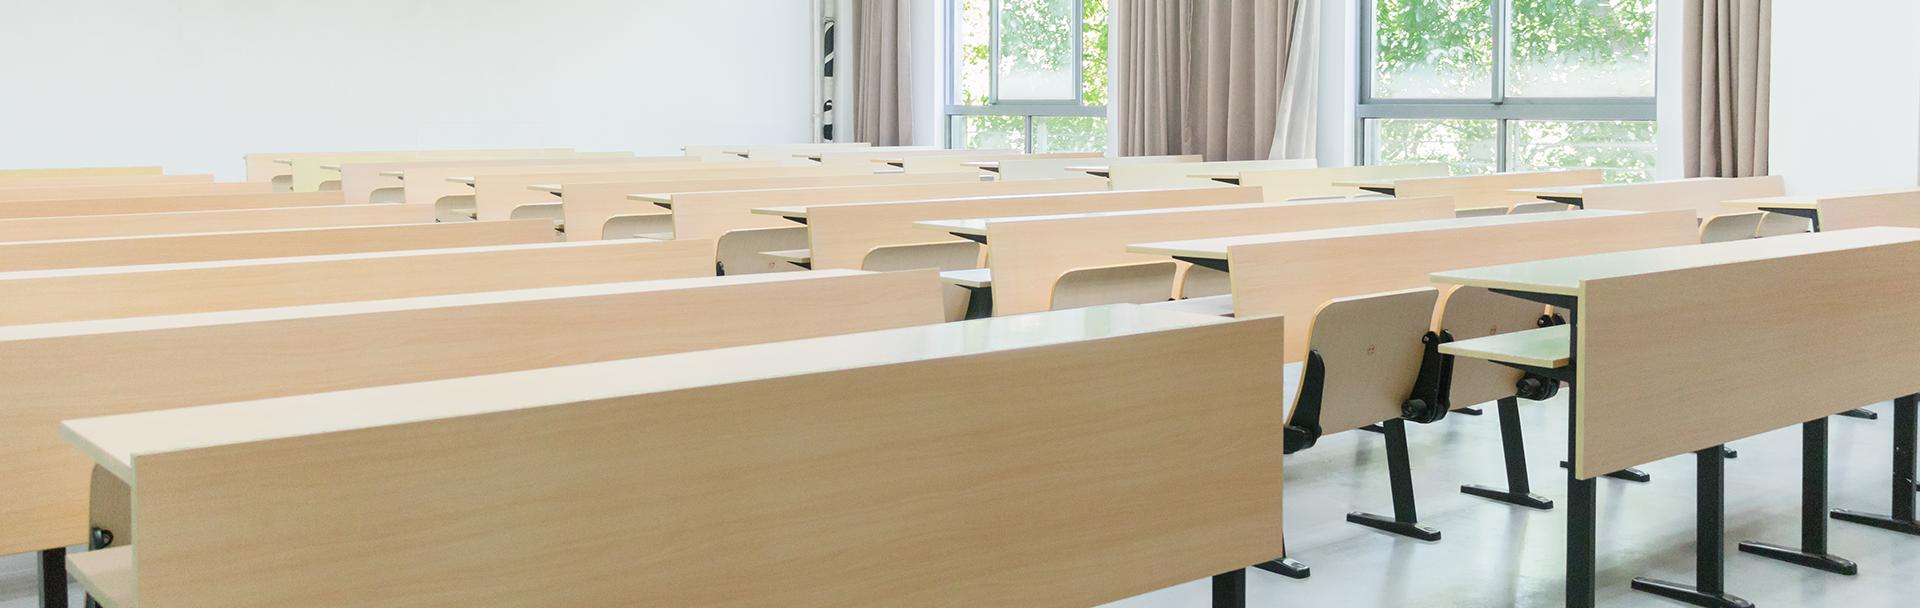 Healthy Light Environment Classroom